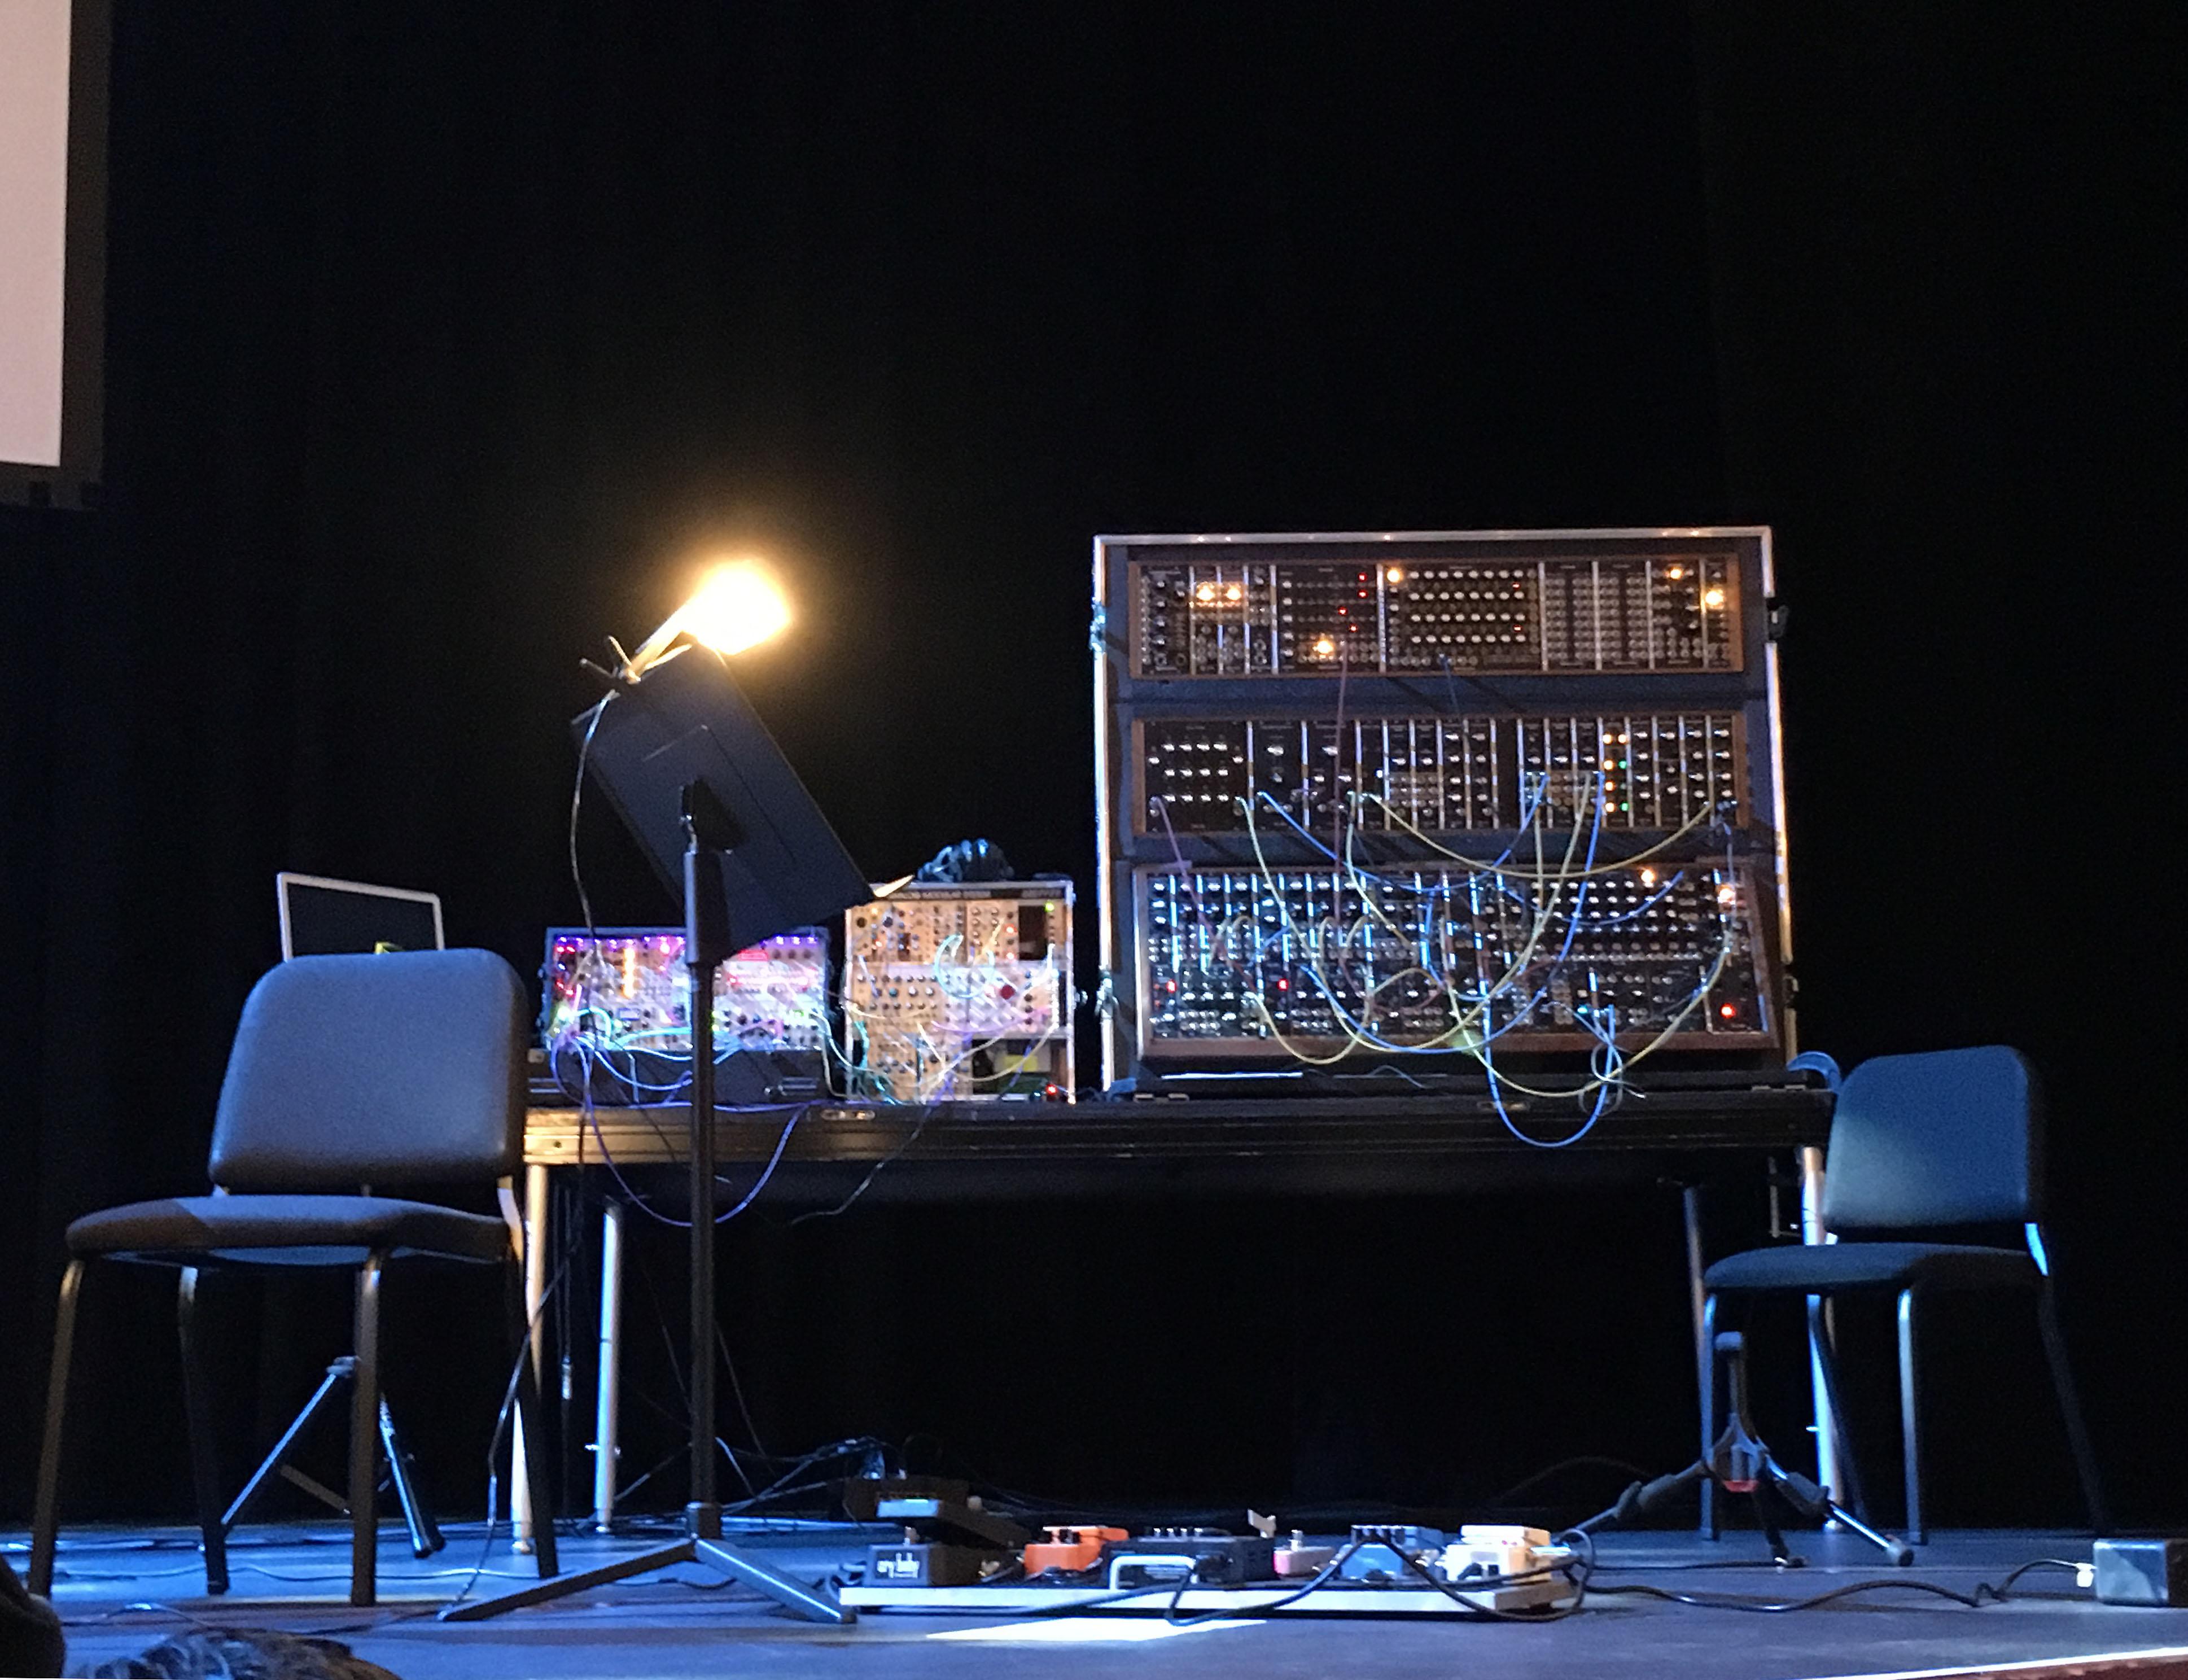 Modular Synthesizer Concert : file hans zimmer 39 s modular synthesizers warped side of the universe concert dr phillips center ~ Vivirlamusica.com Haus und Dekorationen